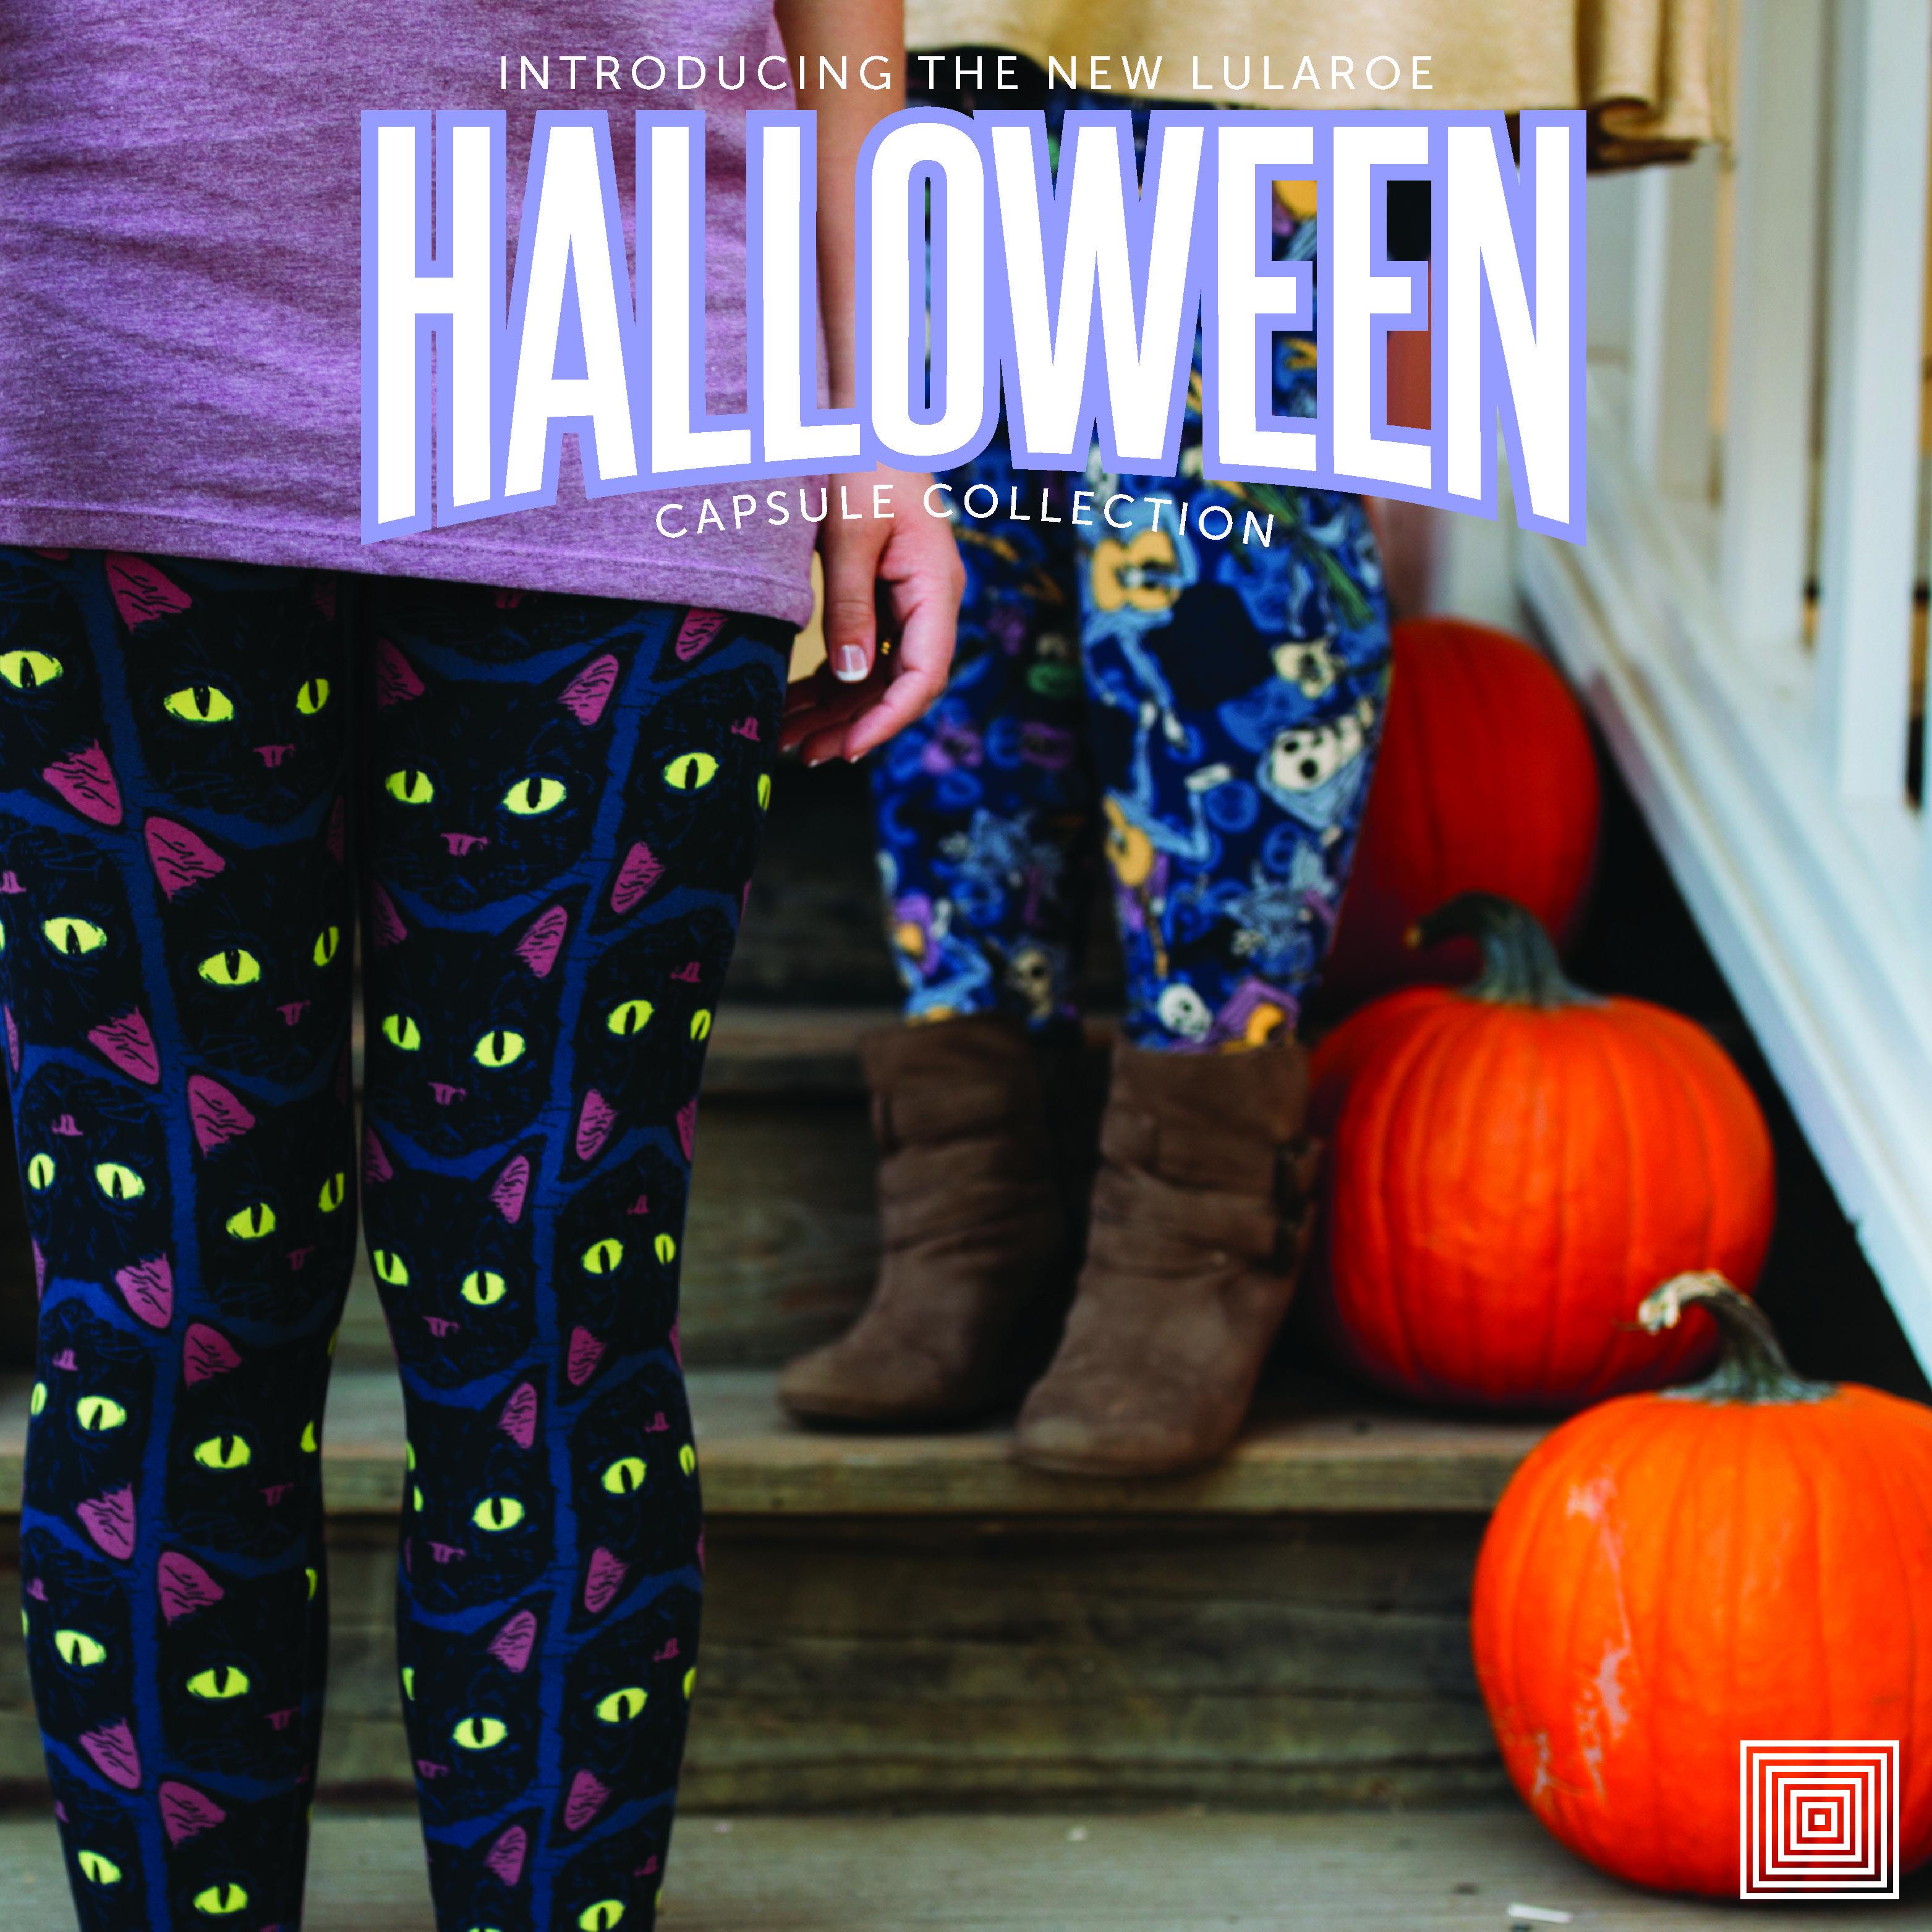 LuLaRoe Halloween Capsule Collection 2017 Leggings | LuLaRoe ...